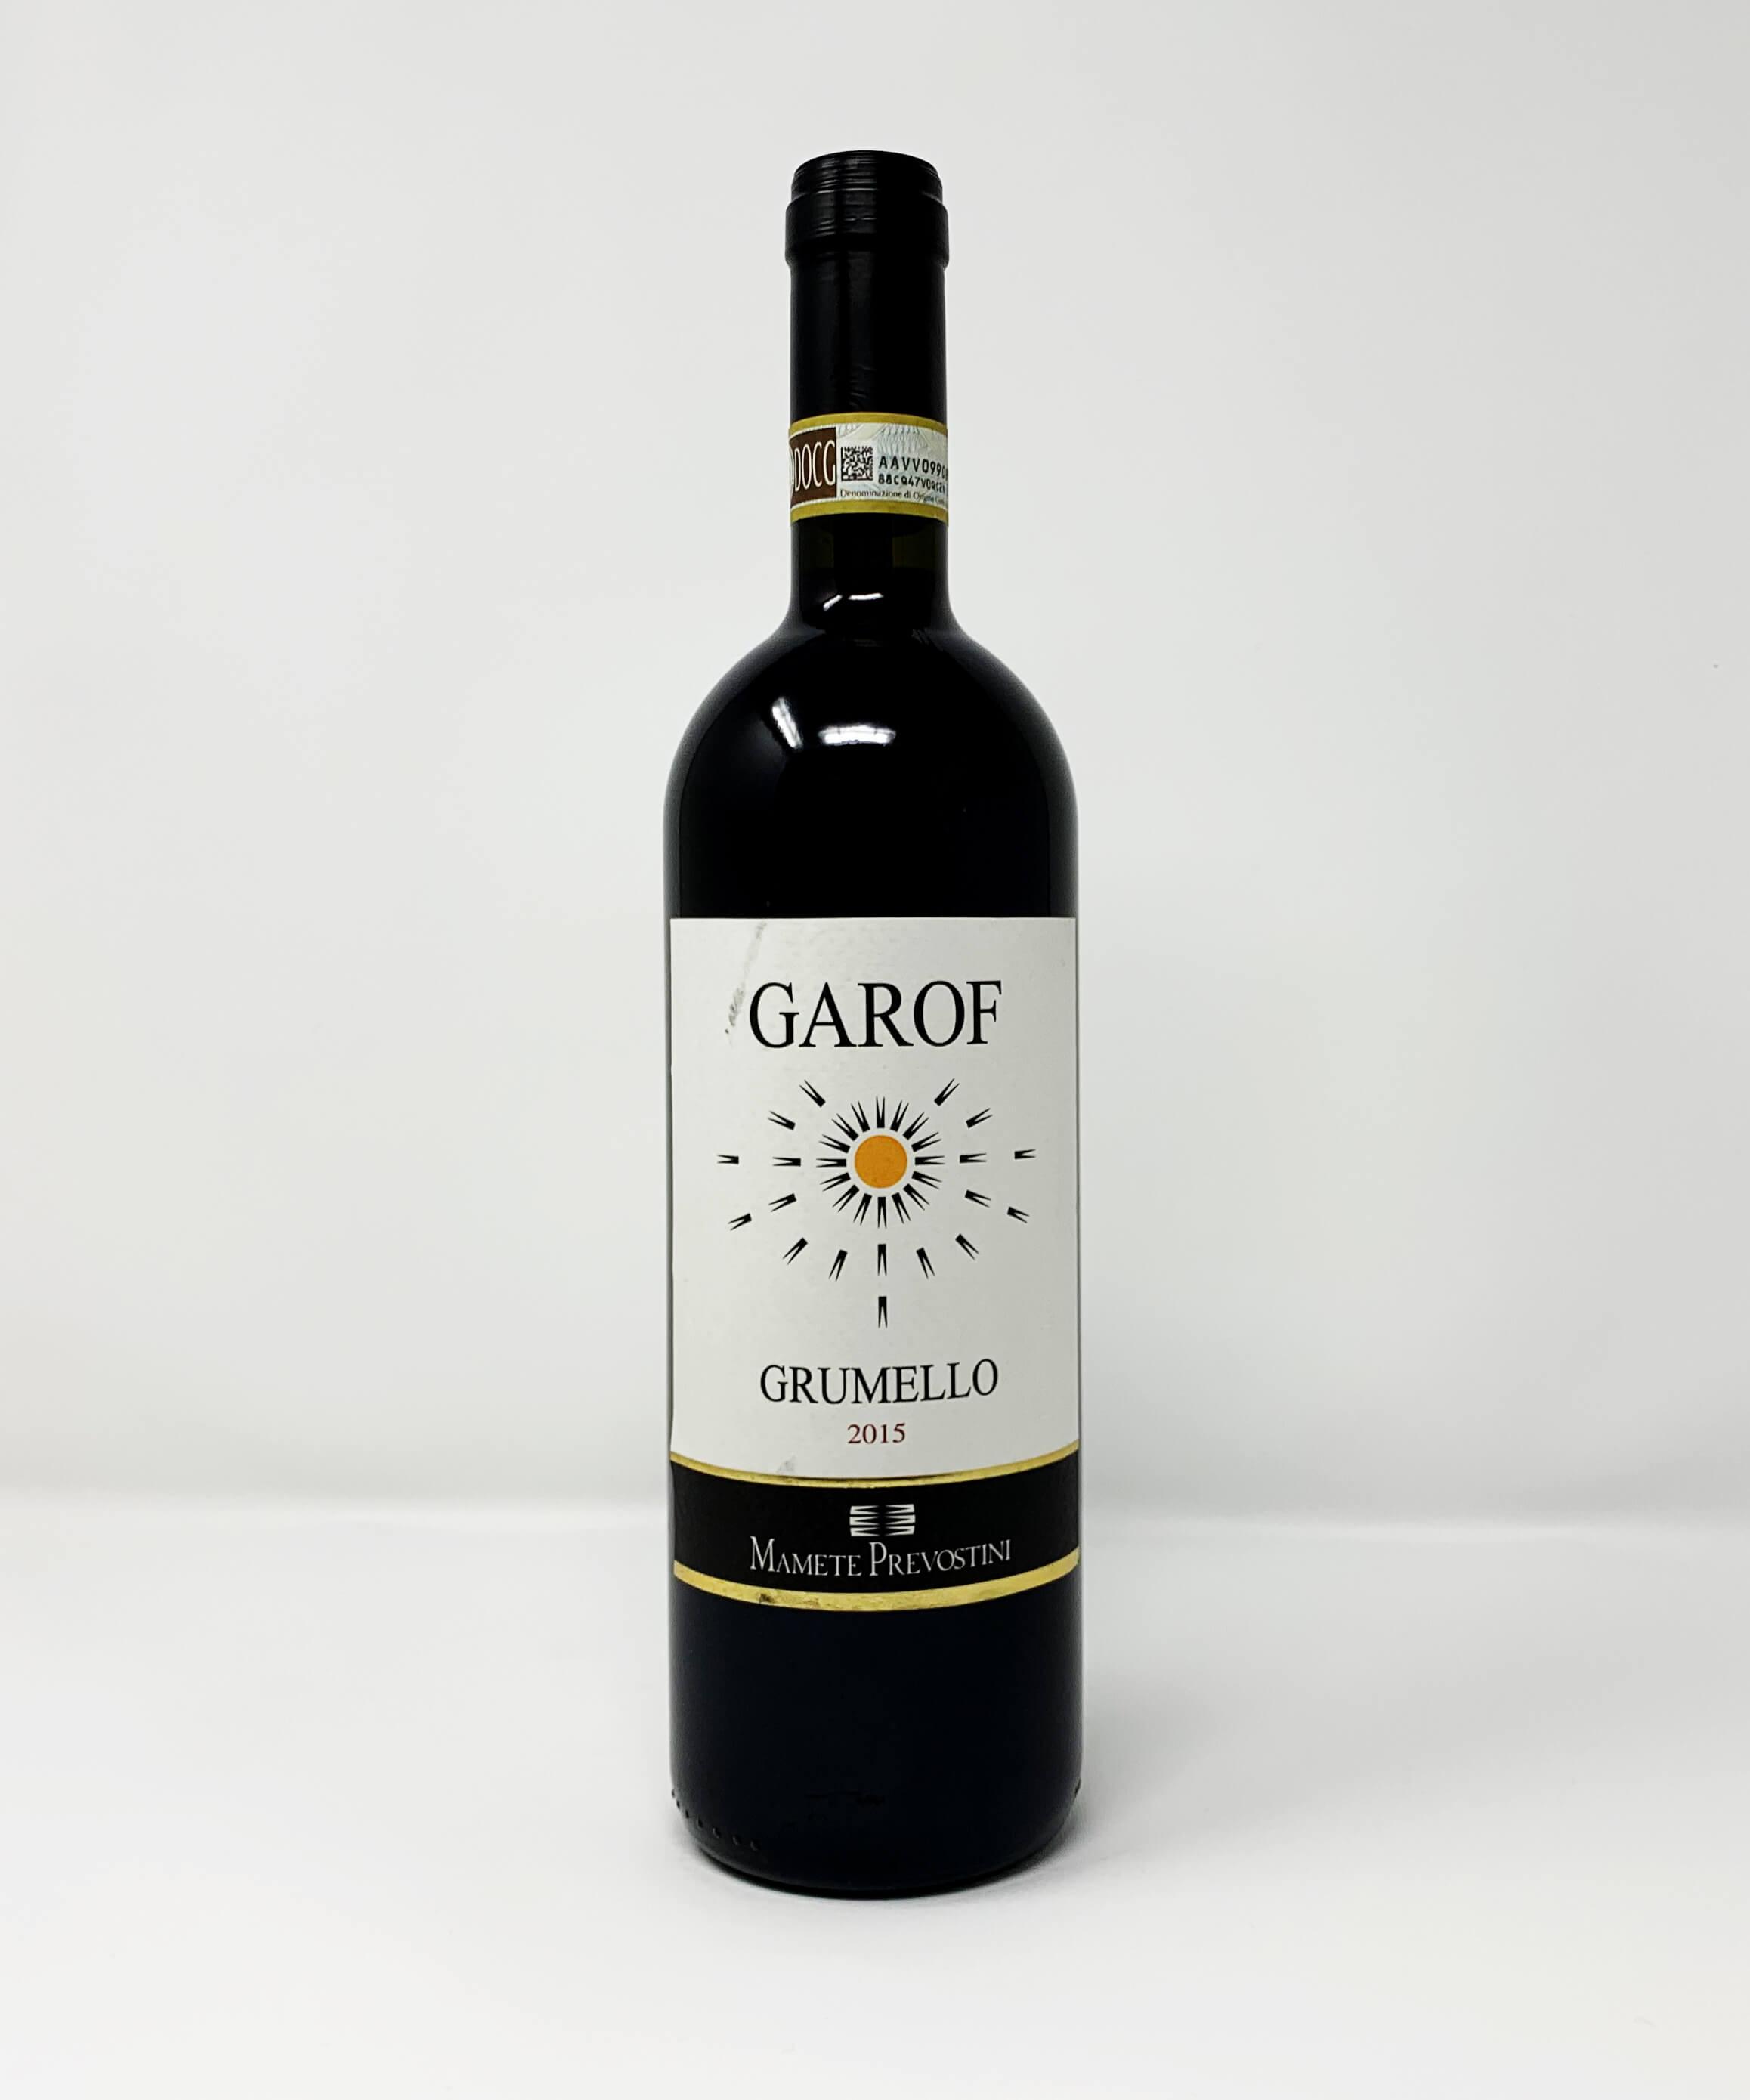 Mamete Prevostini, Garof, Valtellina Superiore, DOCG